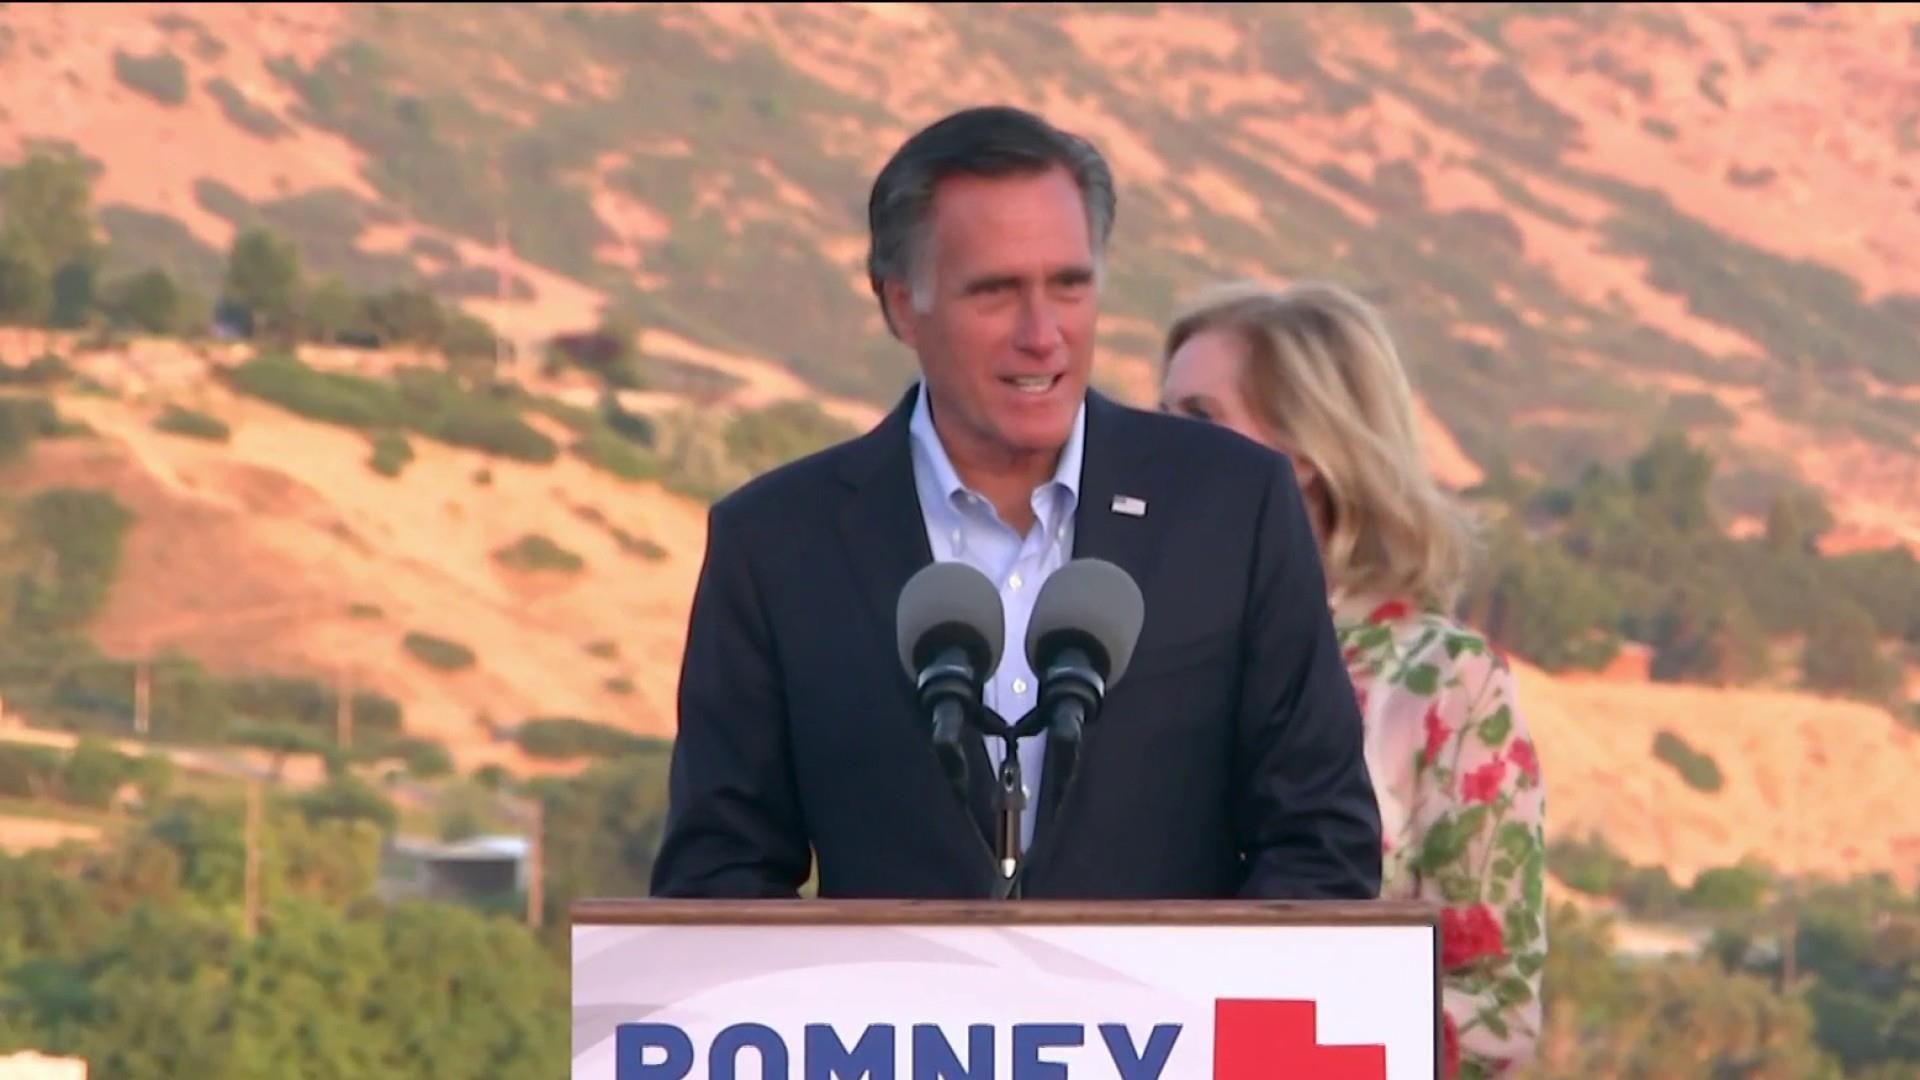 Romney wins Utah primary, publishes op-ed on Trump agenda